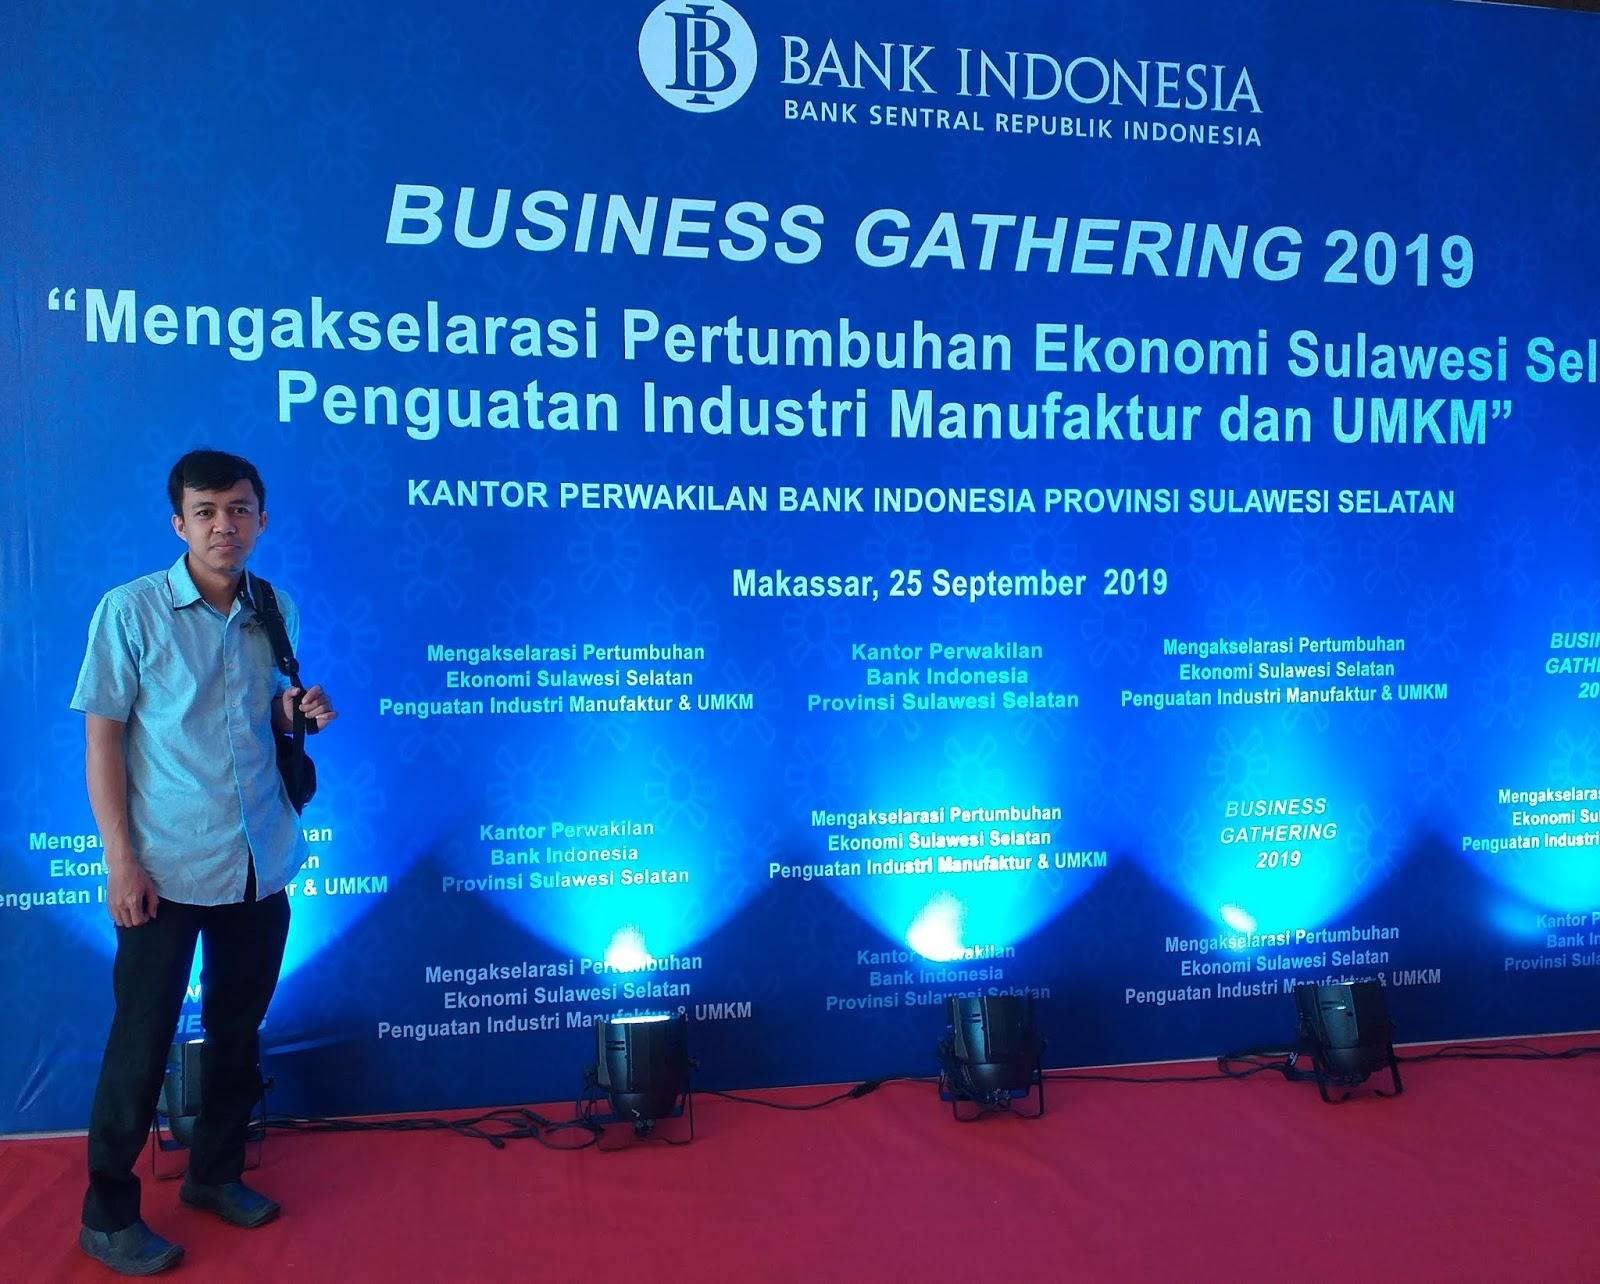 Kedai Madu Sulawesi Ikut Business Gathering 2019